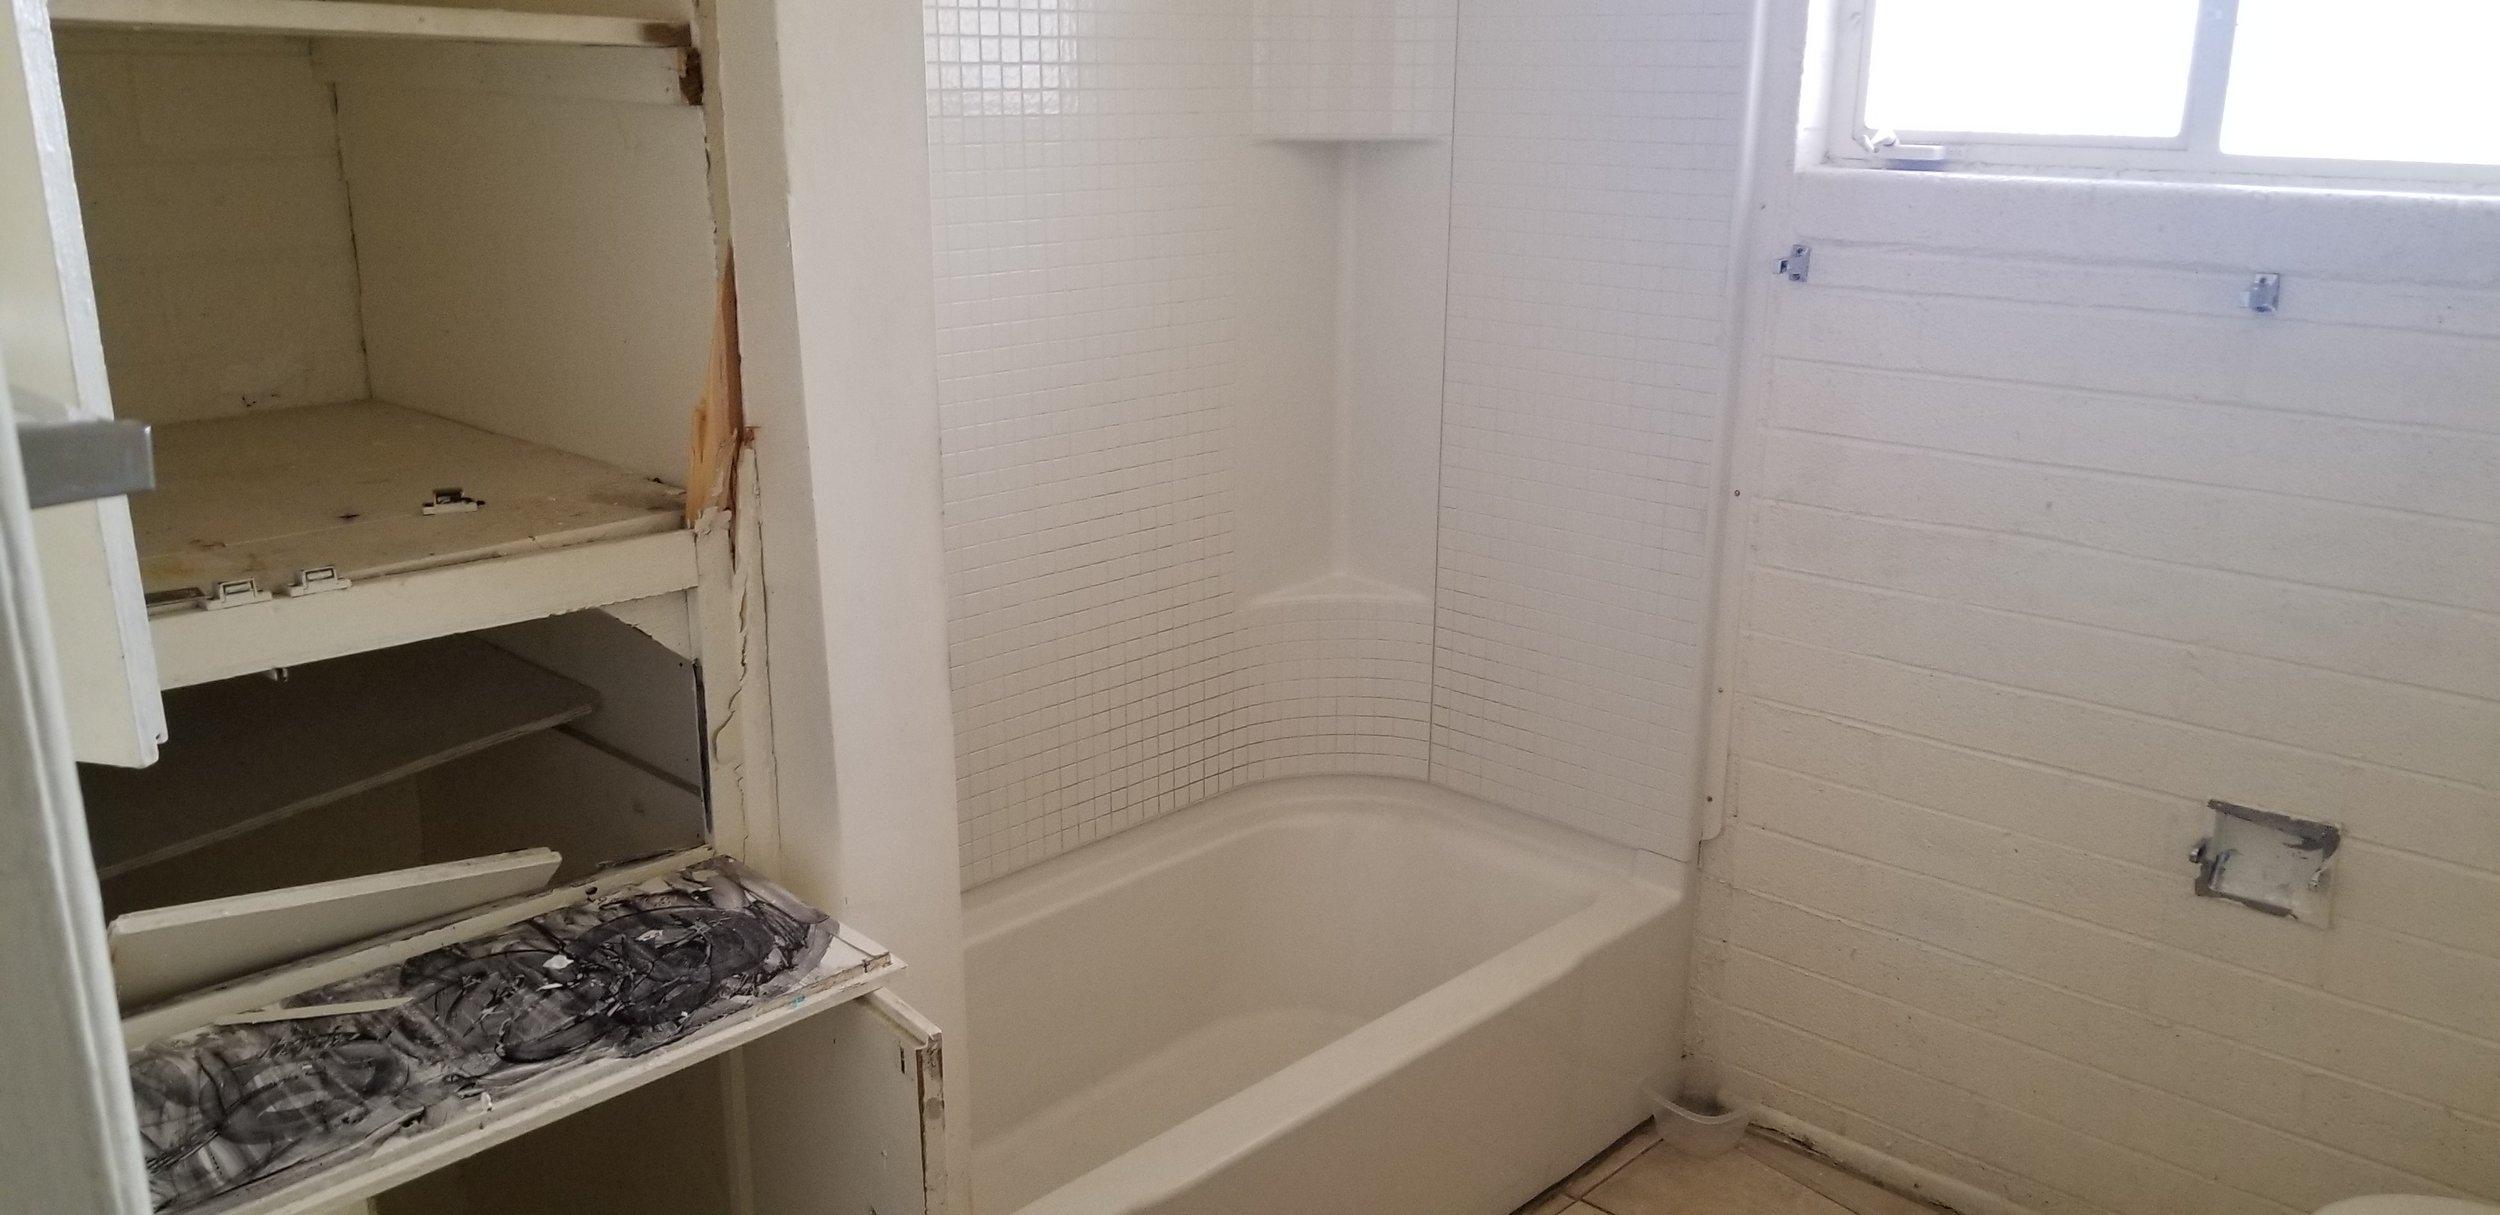 Bath demo